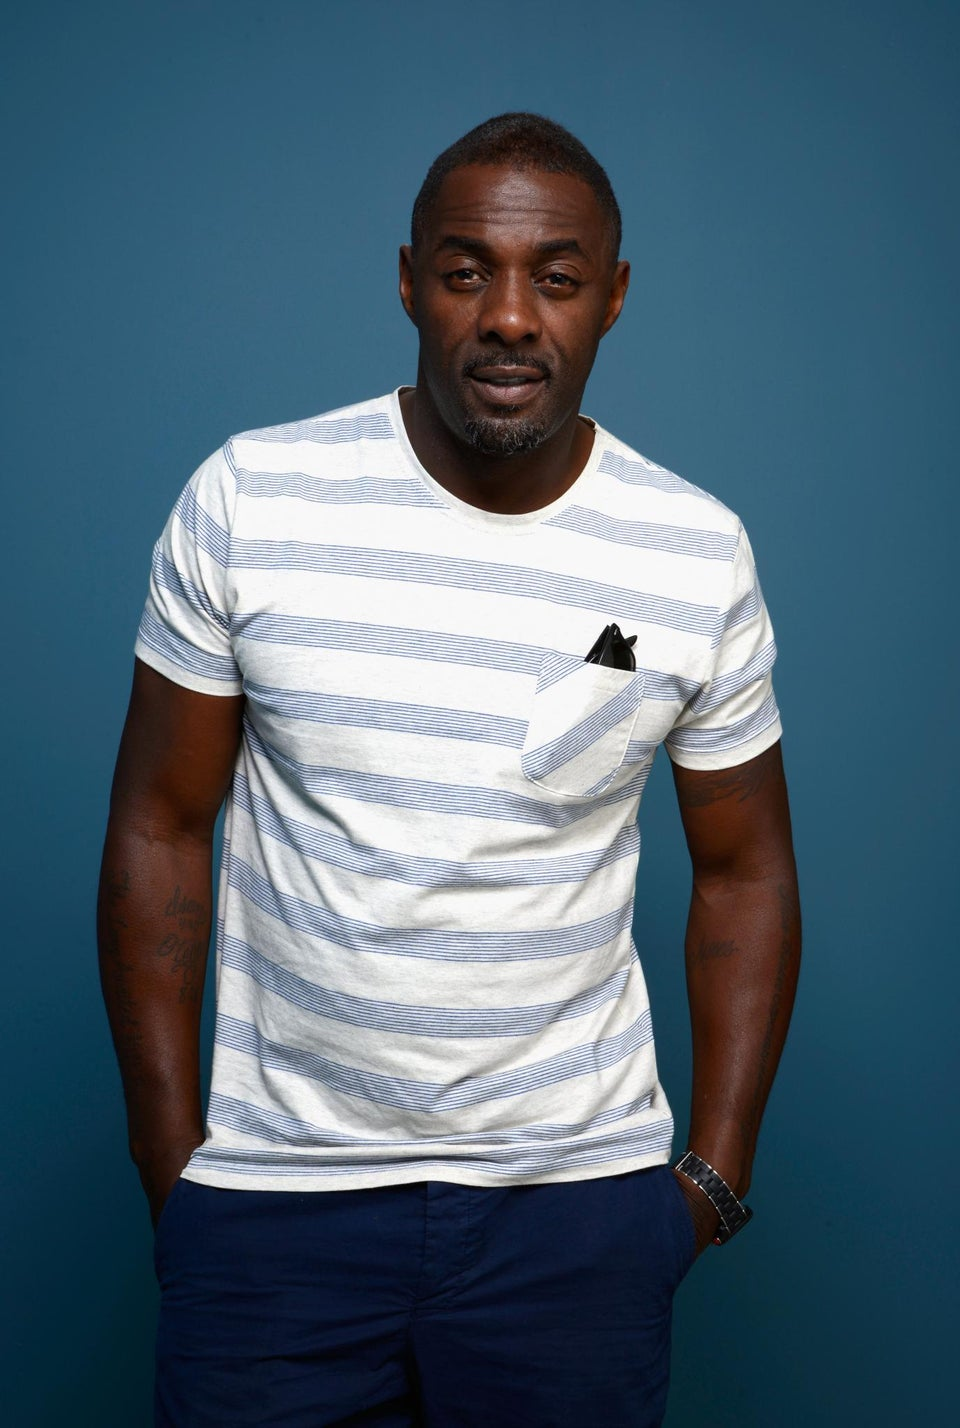 Idris Elba Suffers An Asthma Attack